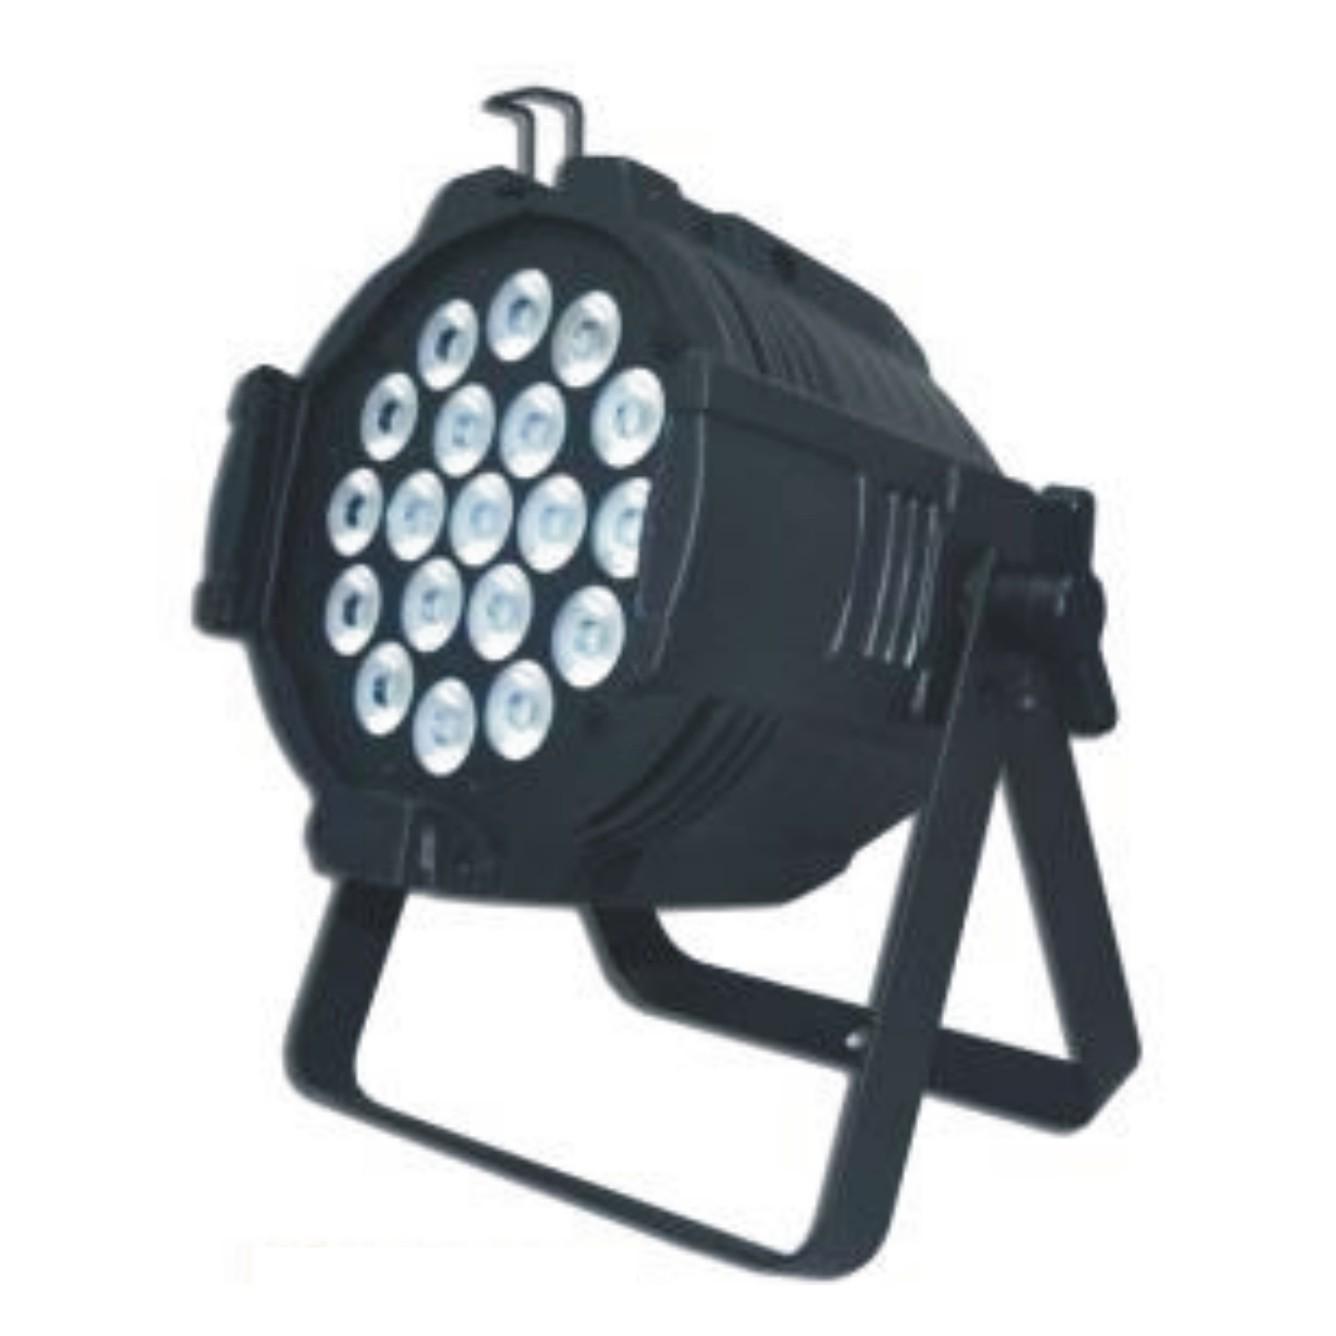 SL ePAR 180 LED PAR灯